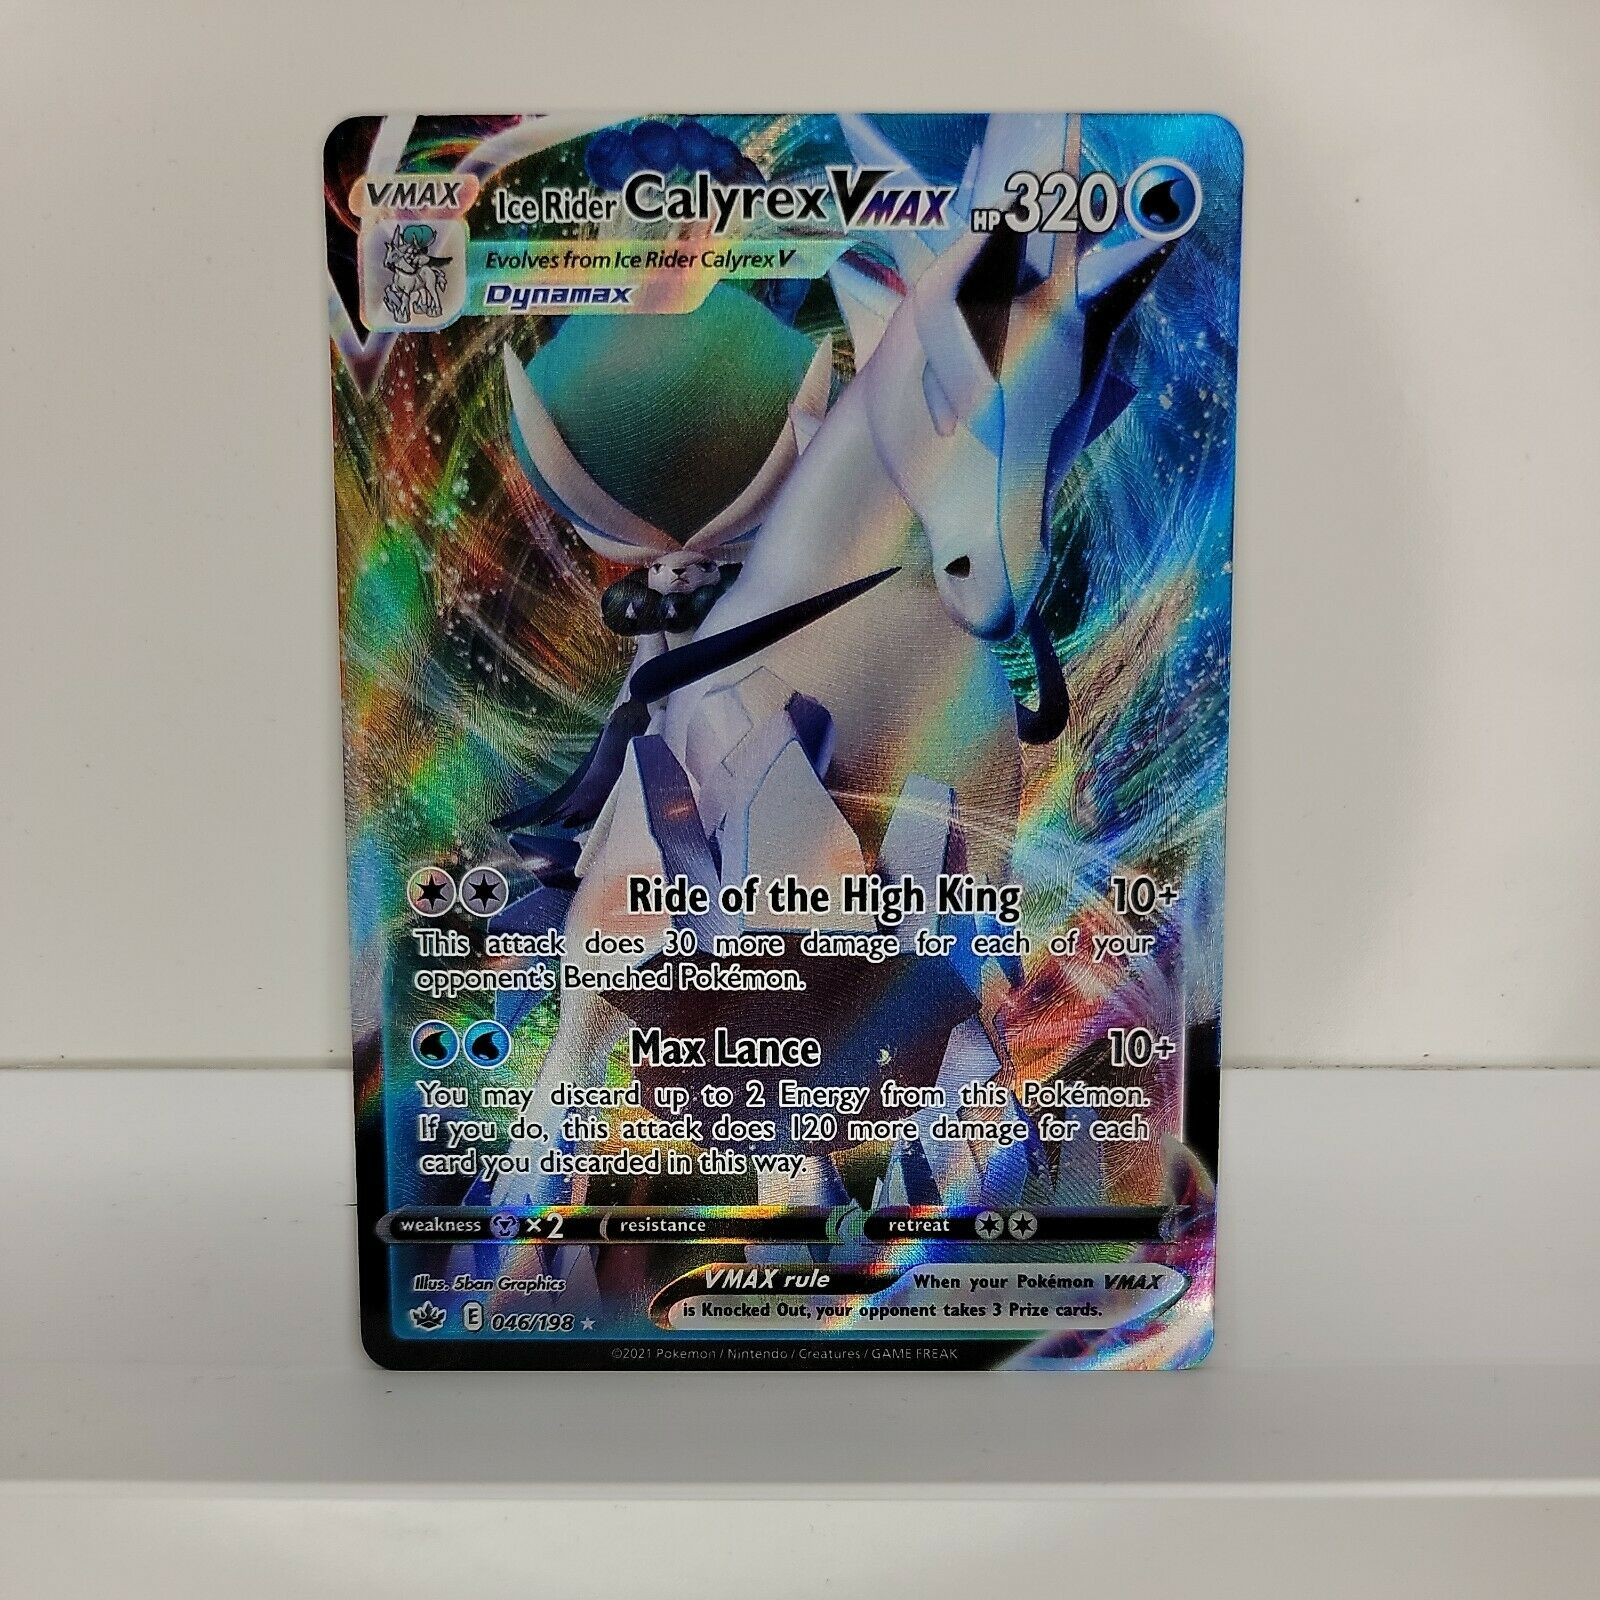 Sword & Shield Chilling Reign Pokemon Card, Ice Rider Calyrex Vmax 046/198 Ultra